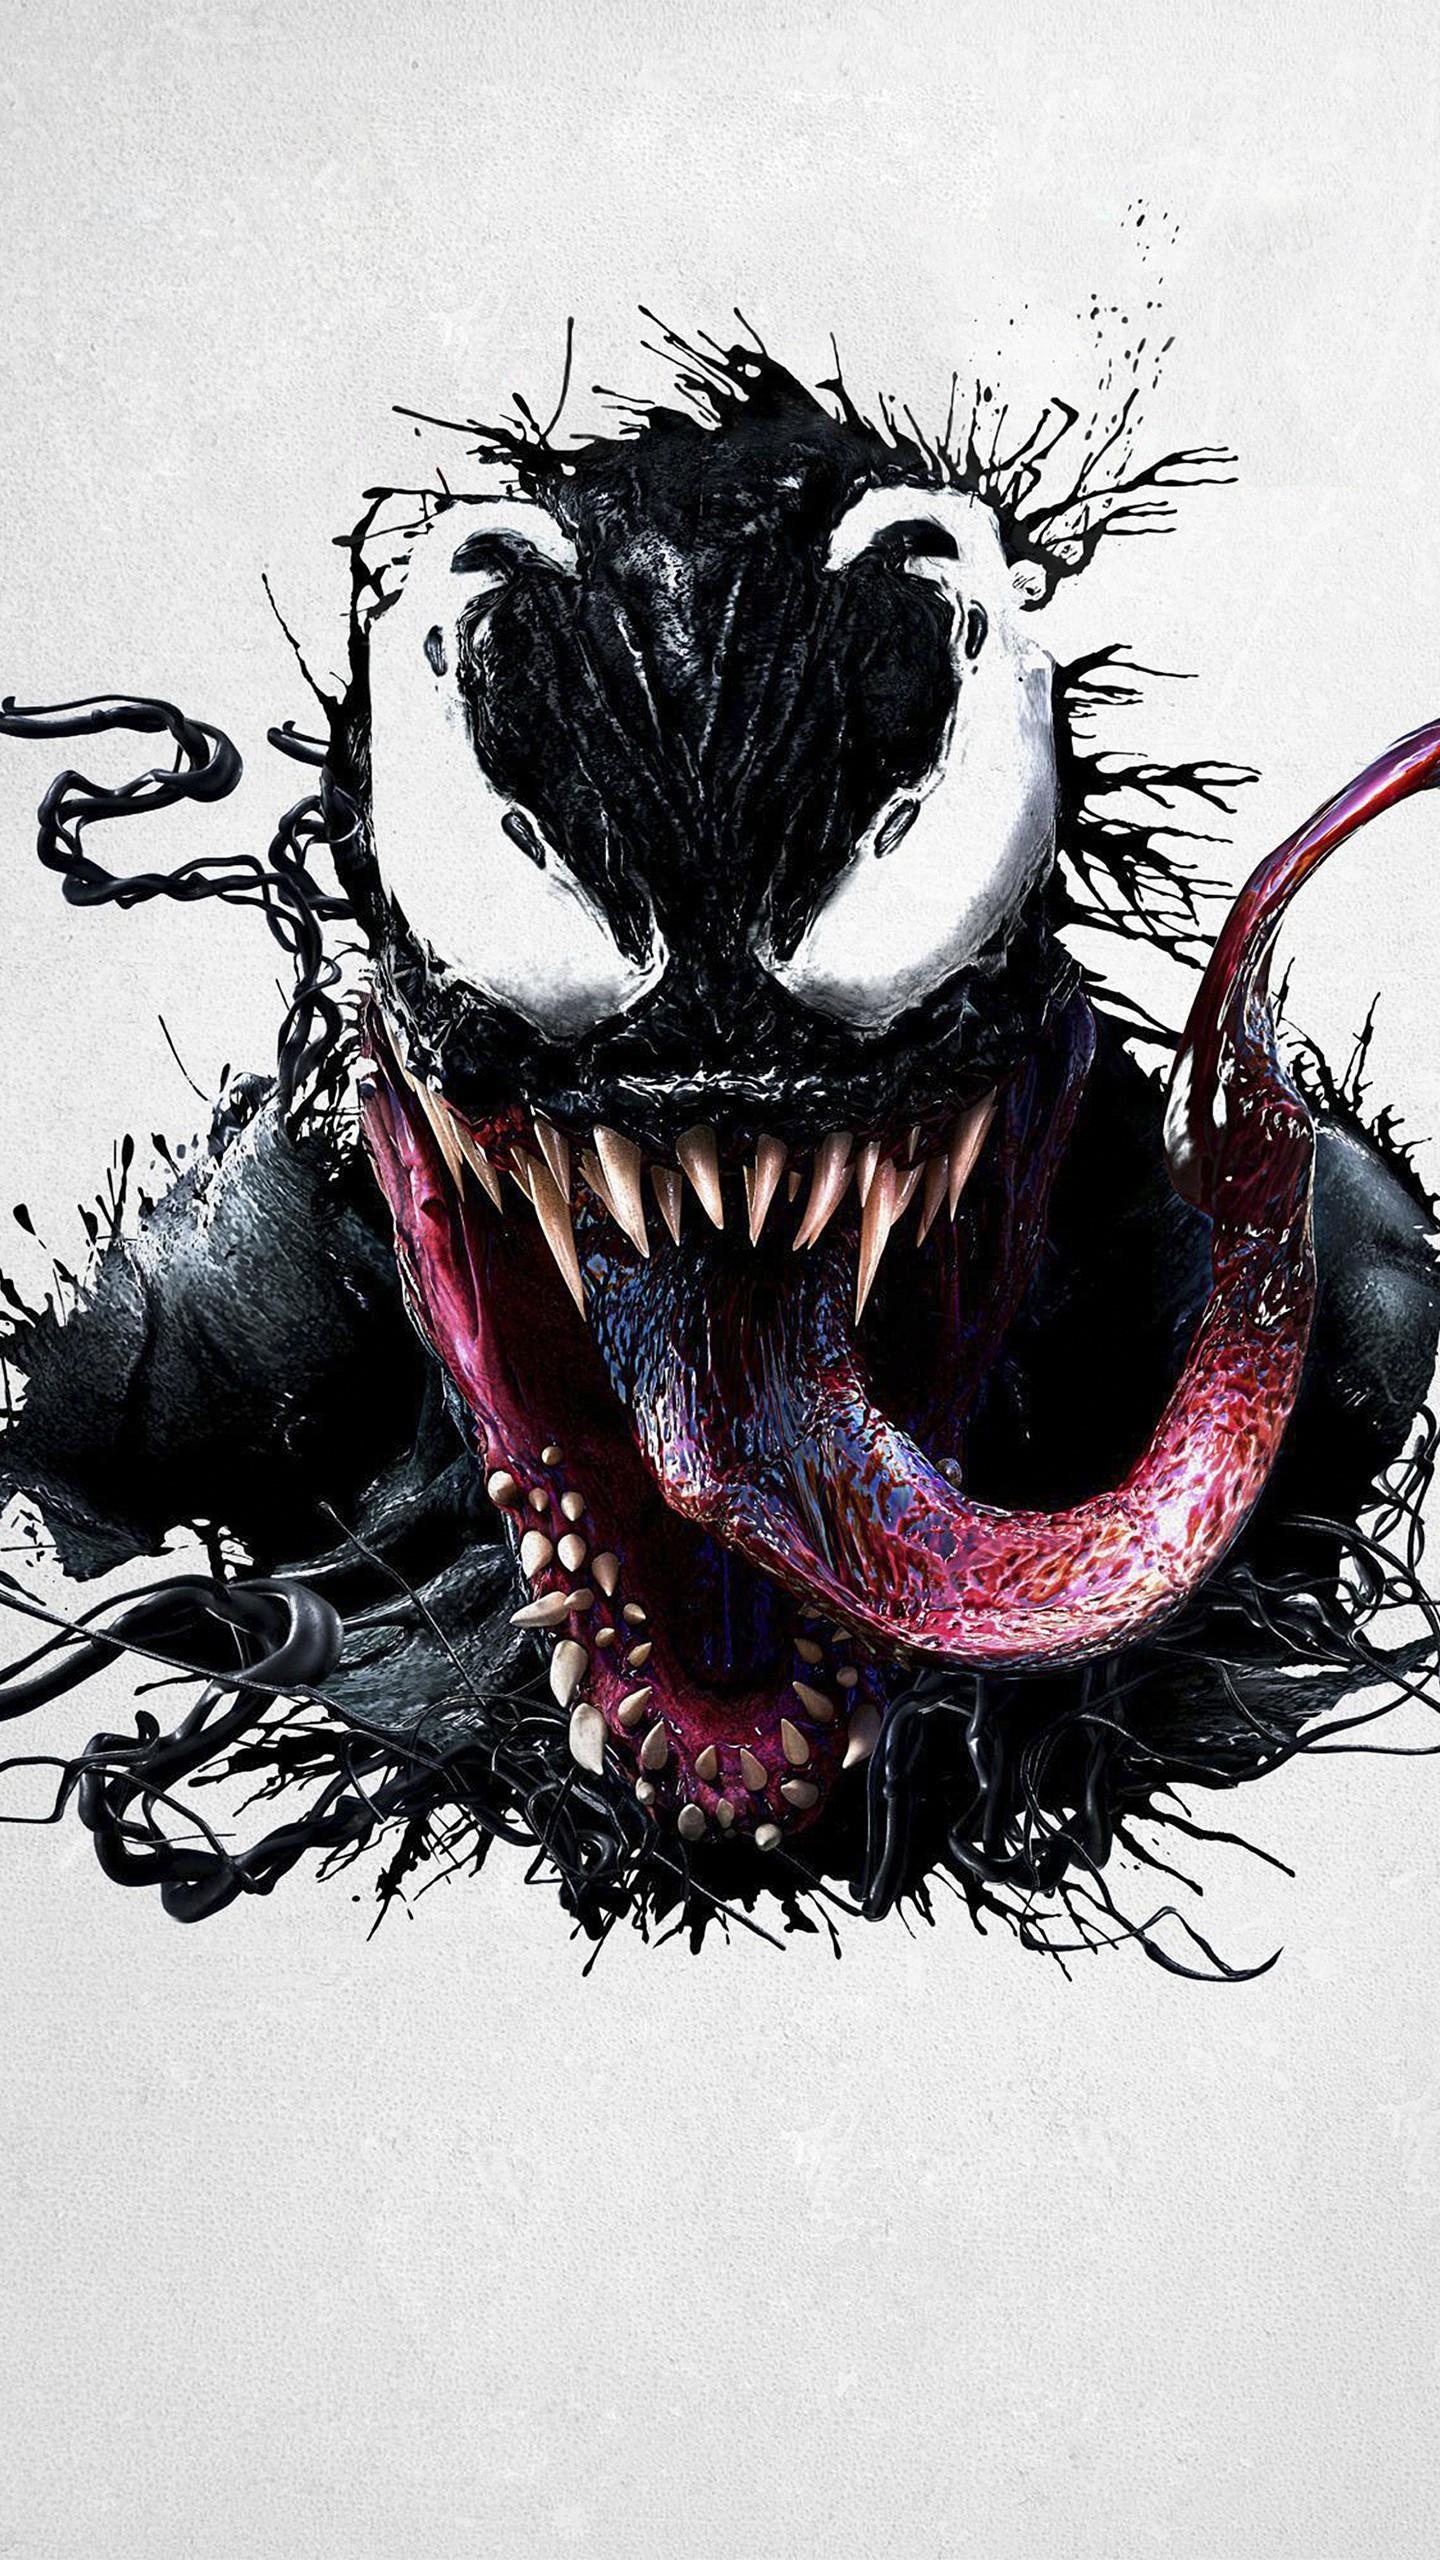 Iphone X Star Wars Wallpaper Venom Imax Promotional Art Wallpapers Hd Wallpapers Id